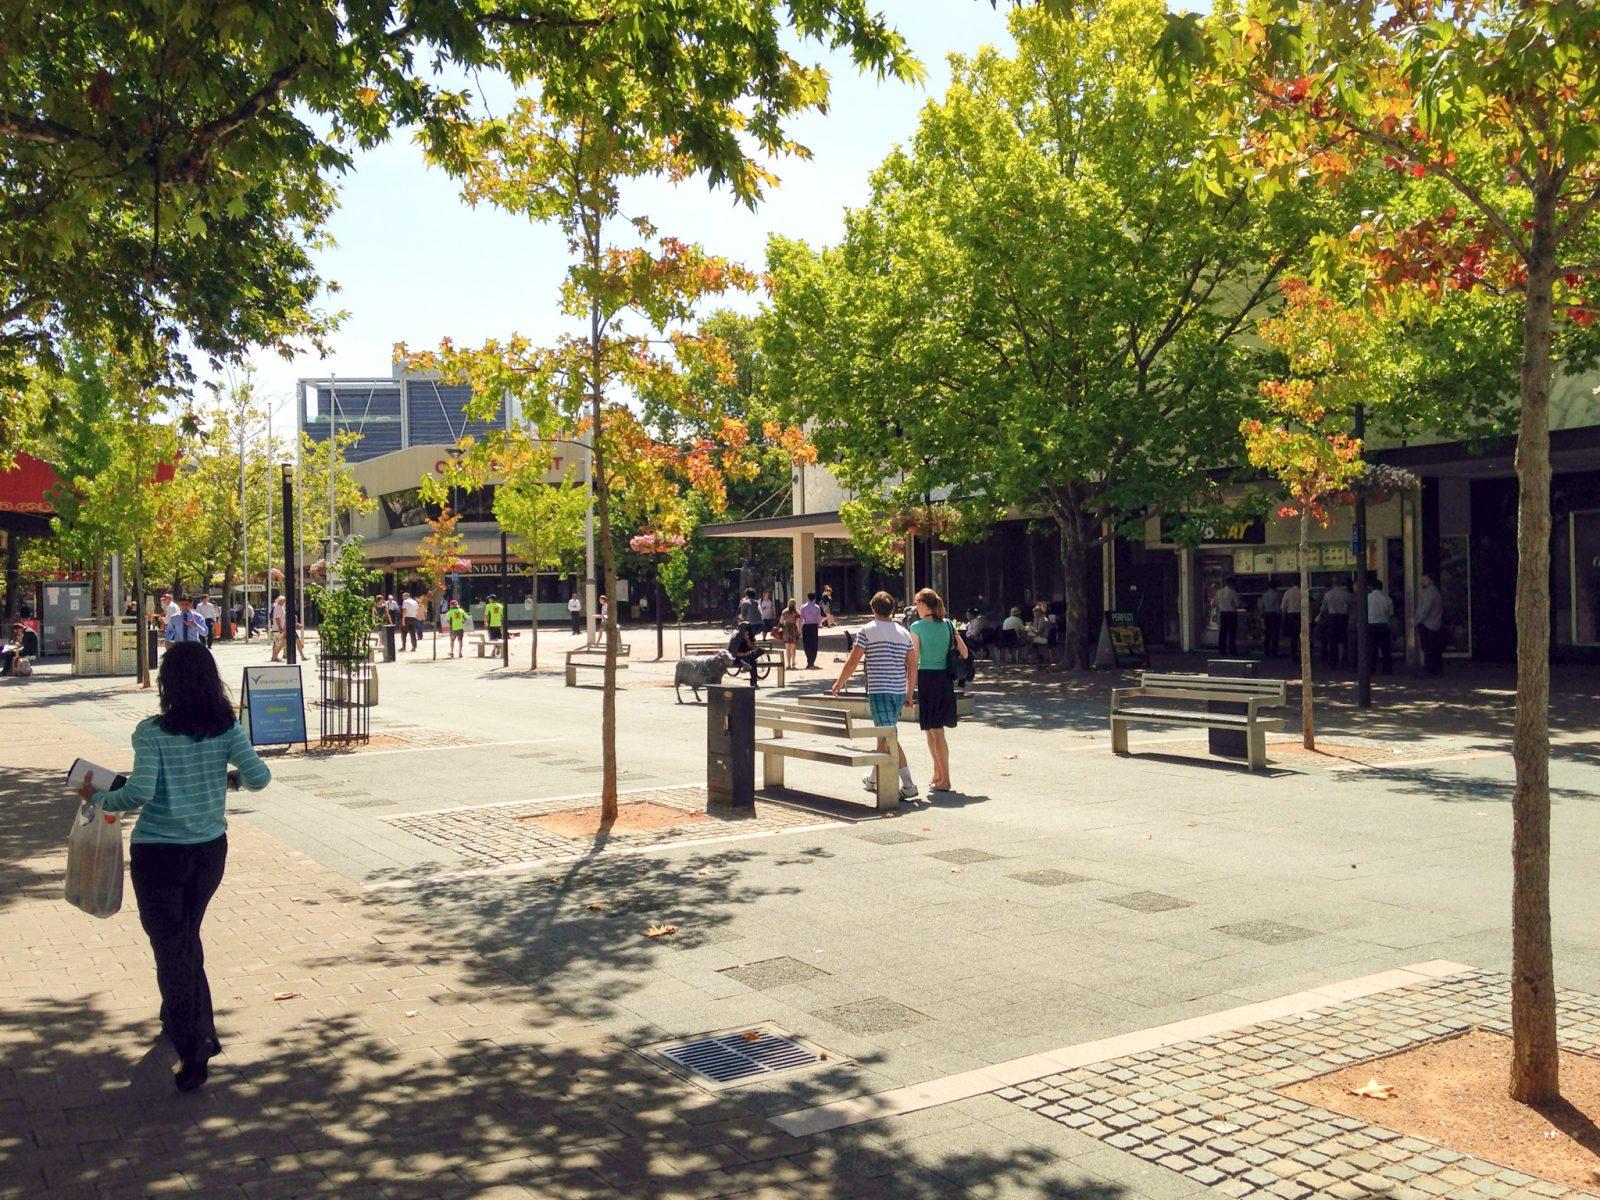 Public Art in Canberra City: Self-guided tour designed by Deborah Clark